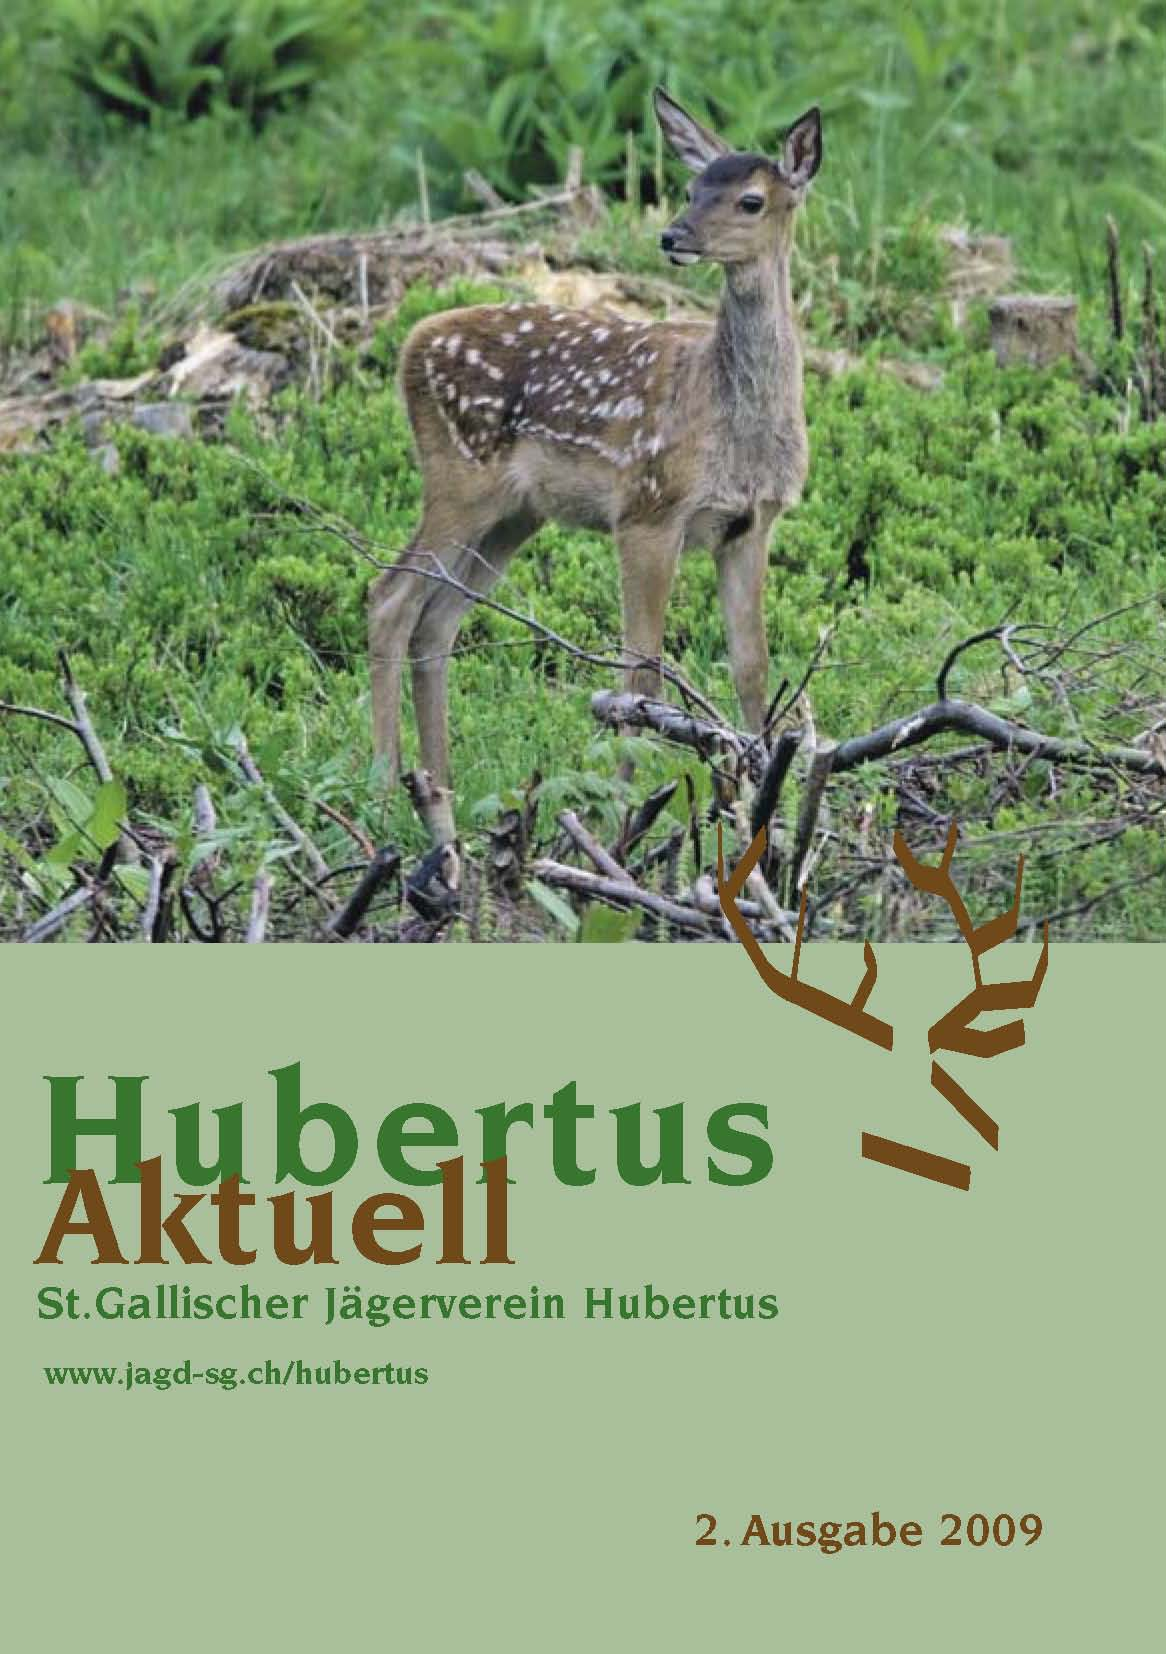 hubertus akutell 02 2009